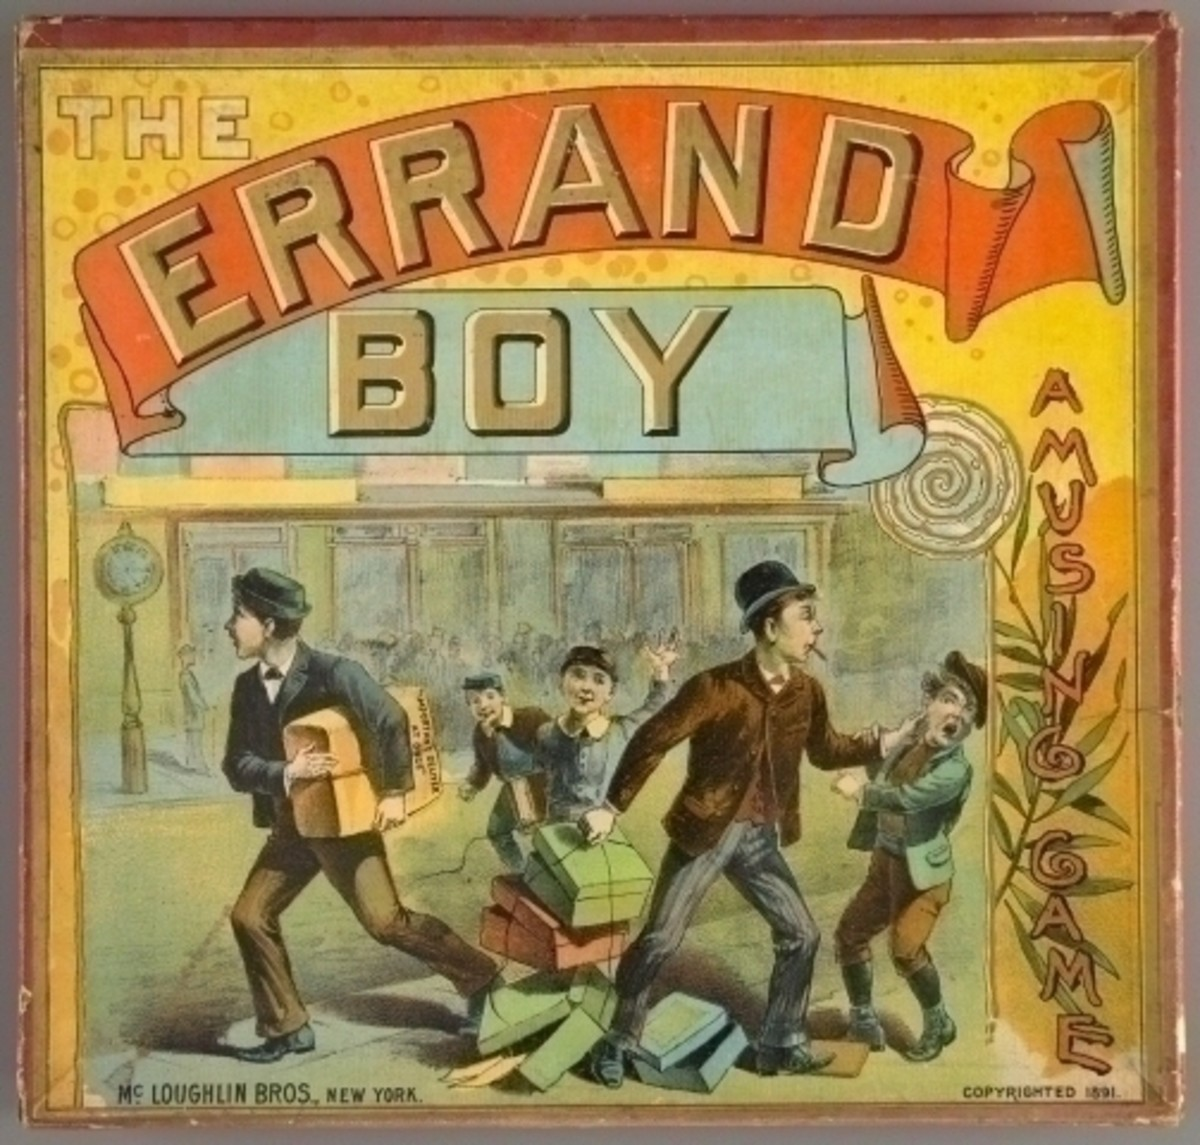 Victorian Errand Boys